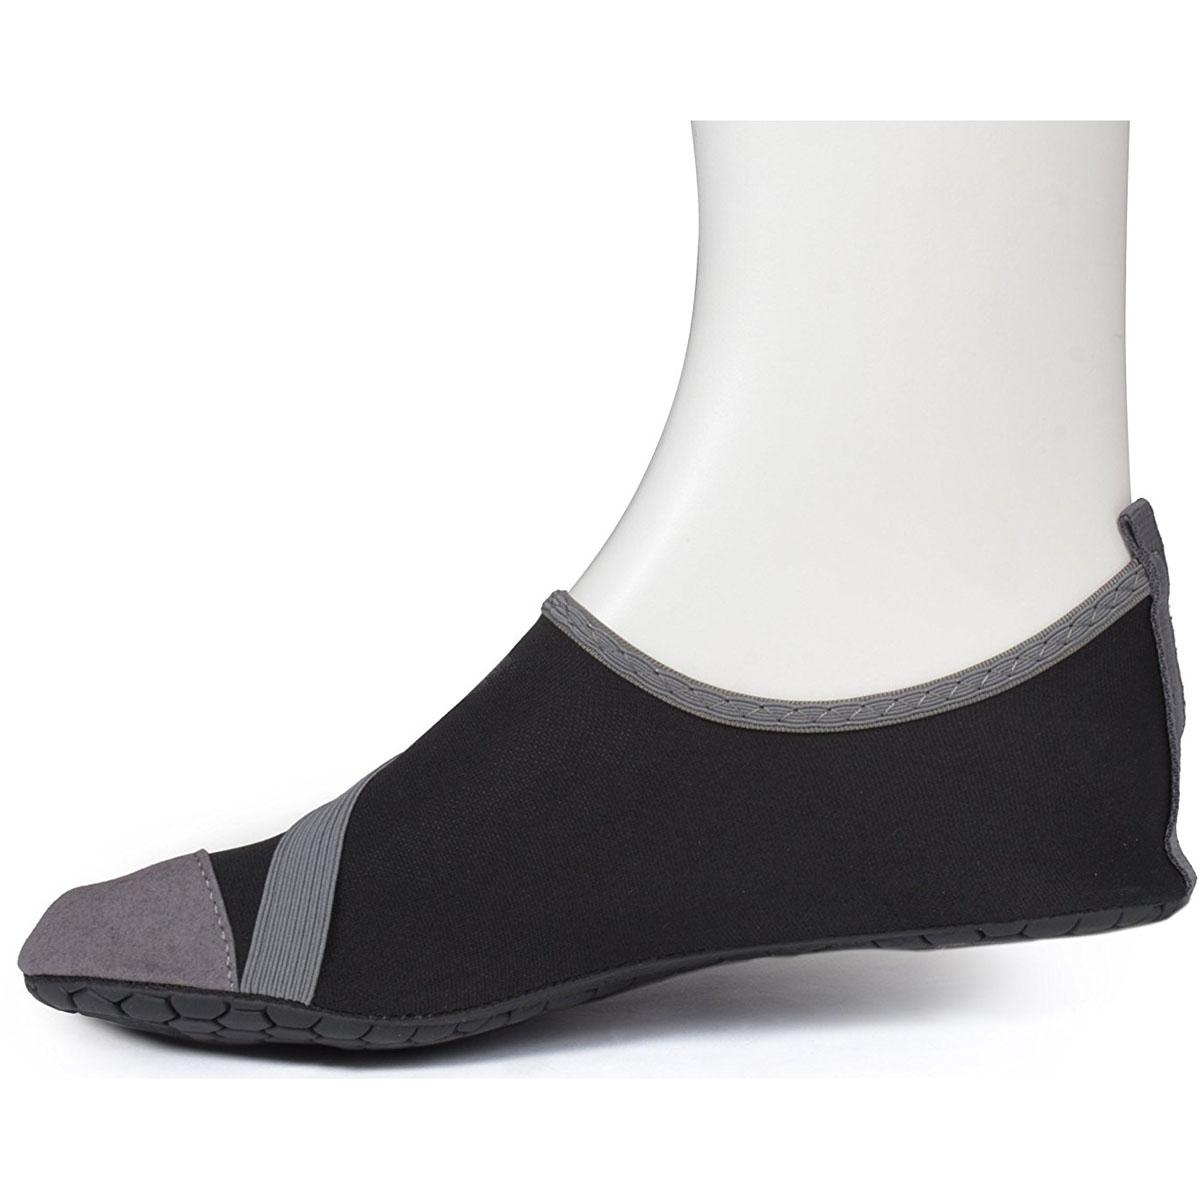 FitKicks-Women-039-s-Non-Slip-Sole-Active-Footwear thumbnail 6